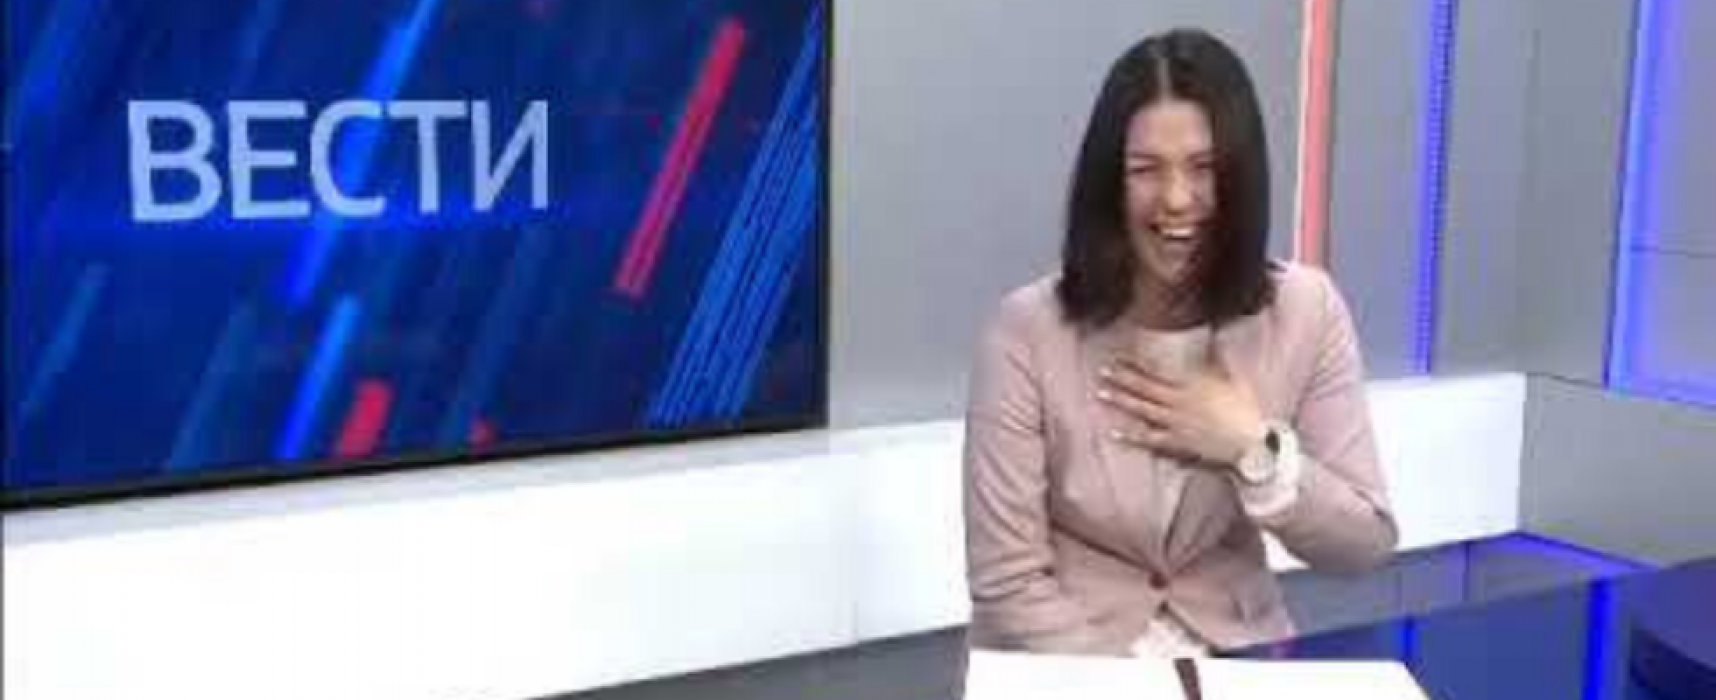 Journalism and laughter: Russians react to pro-Kremlin propaganda